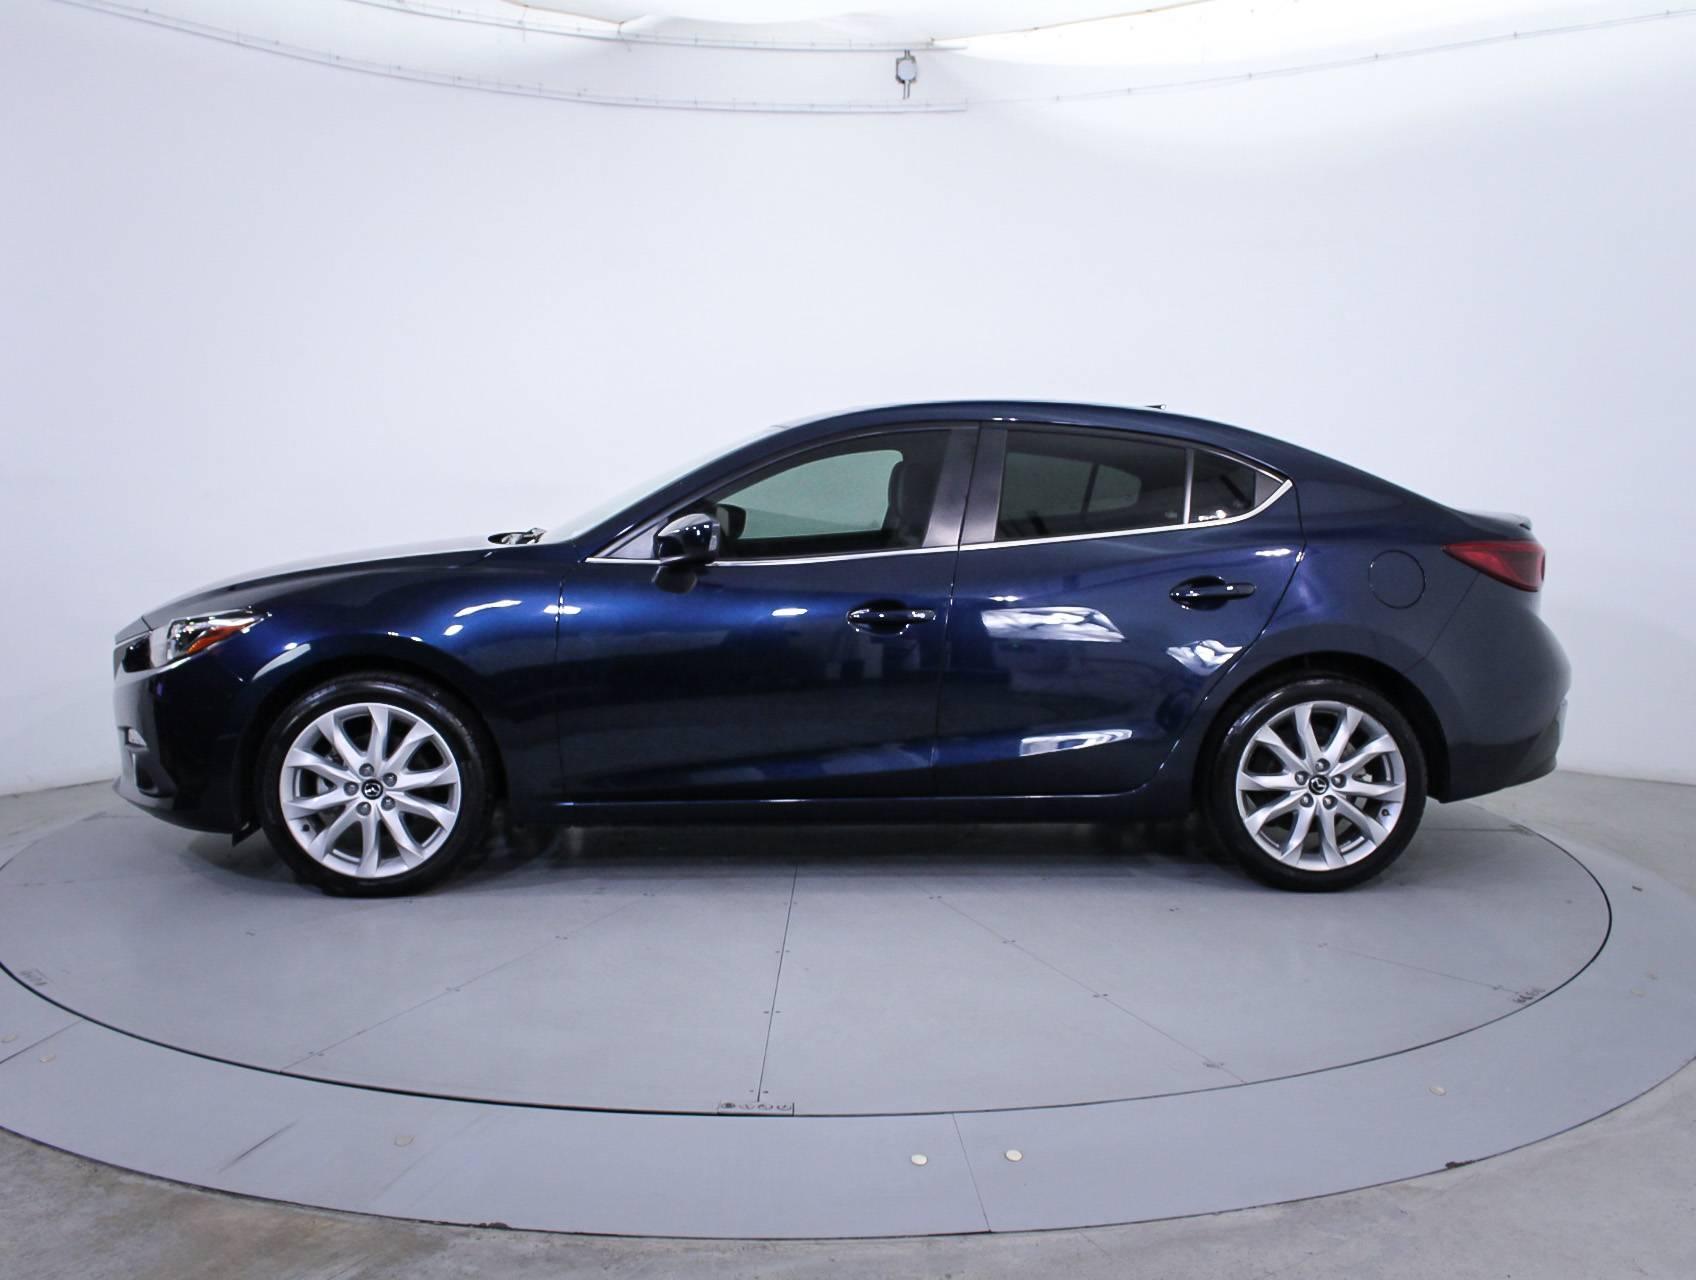 Used 2014 Mazda Mazda3 S Grand Touring Sedan For Sale In Hollywood Fl 84148 Florida Fine Cars